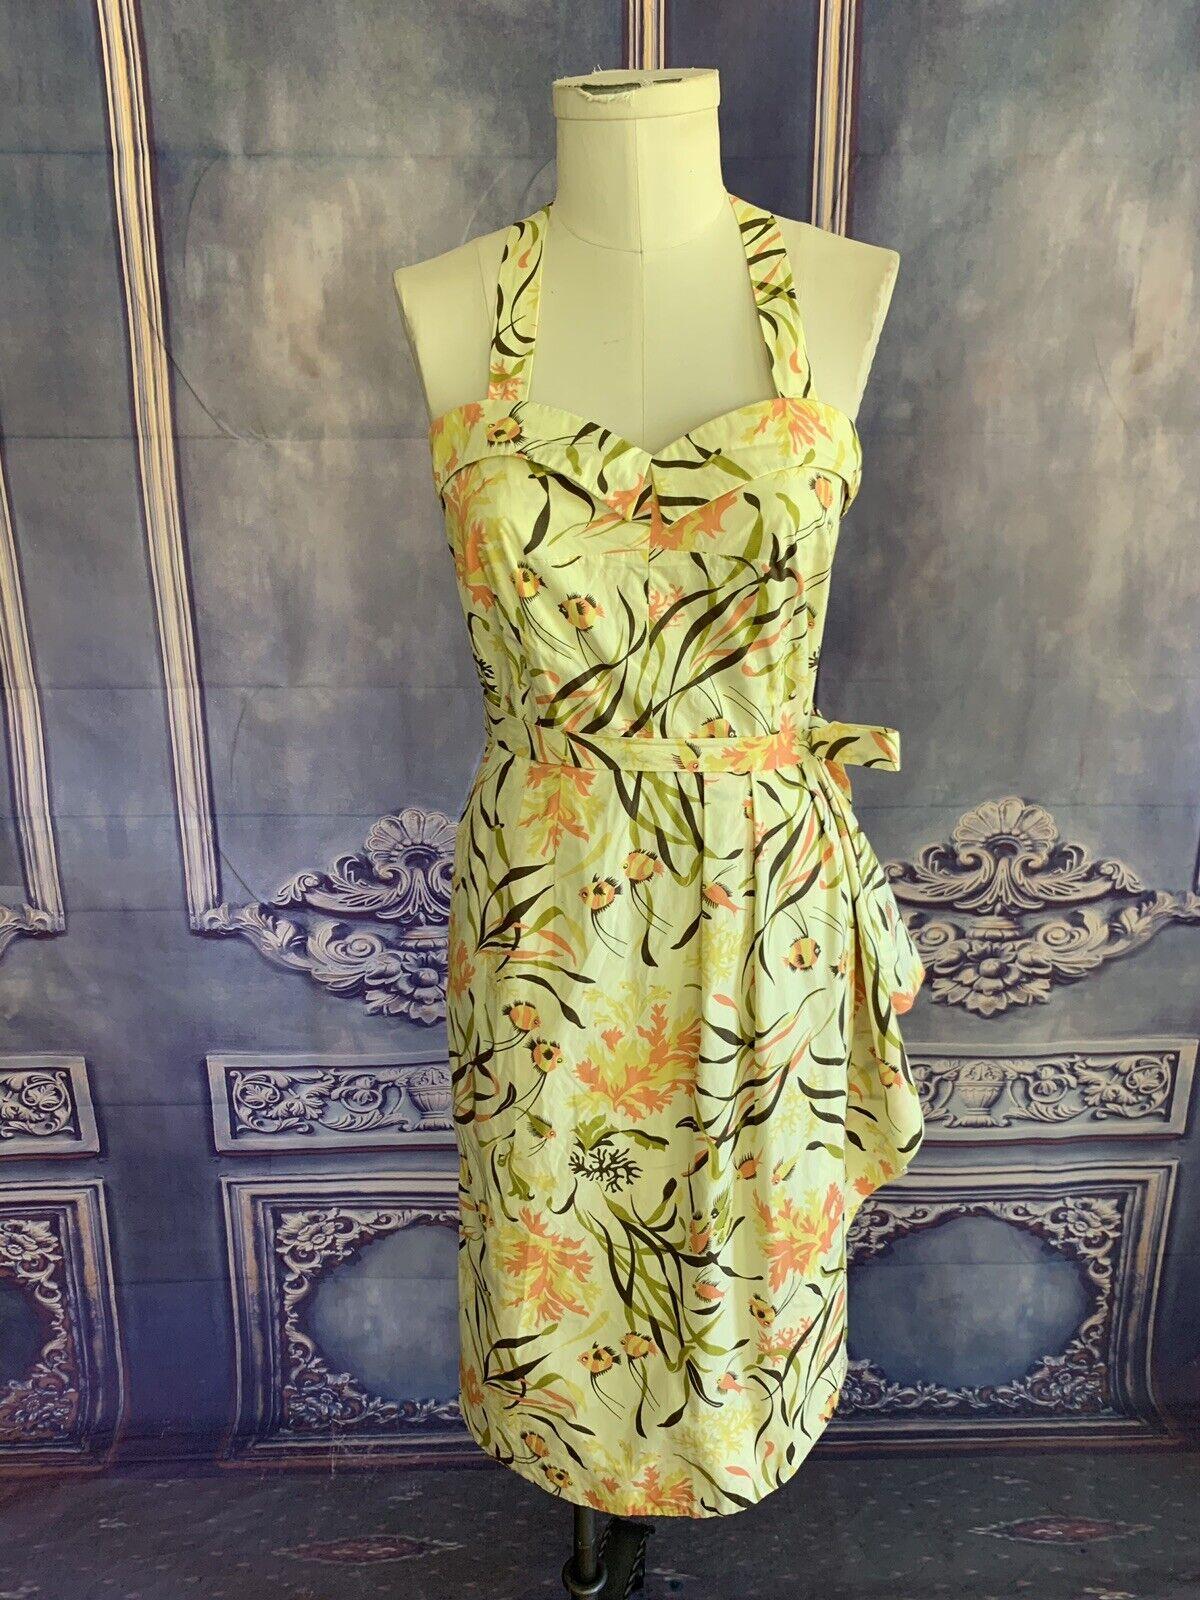 J Peterman Gelb Coral Reef Cotton PinUp Sun Dress SZ 10 Halter w Side Drape